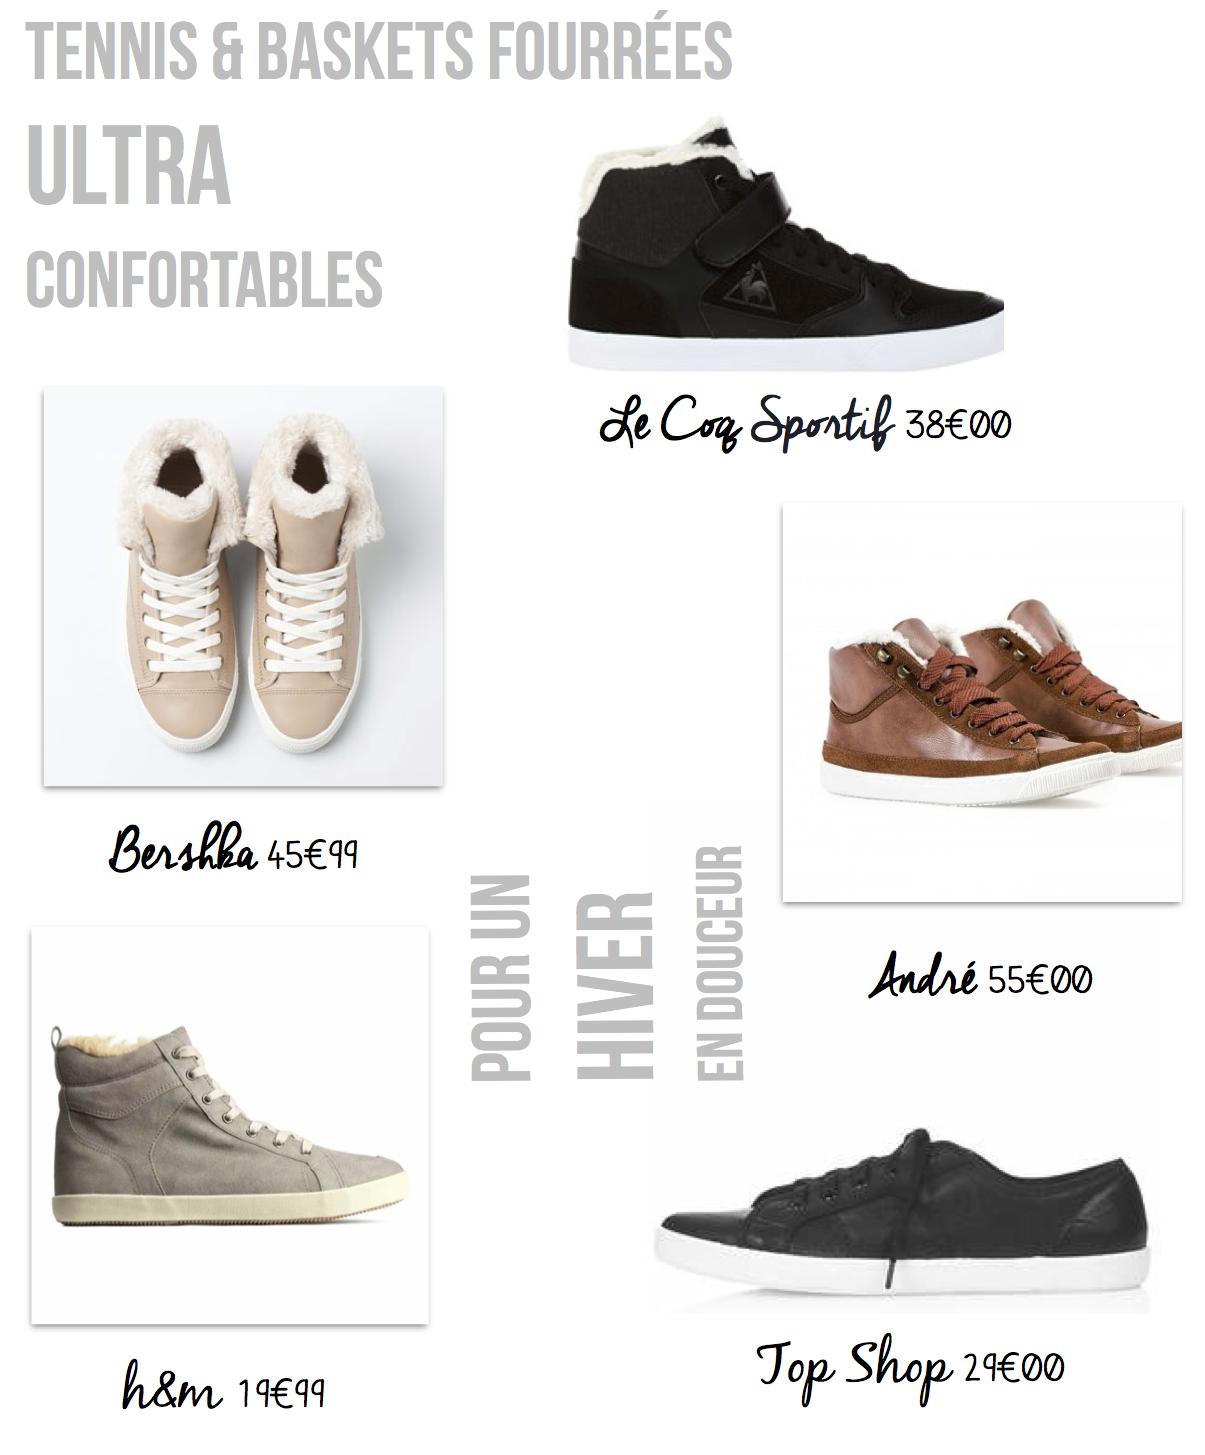 jilbab chaussure